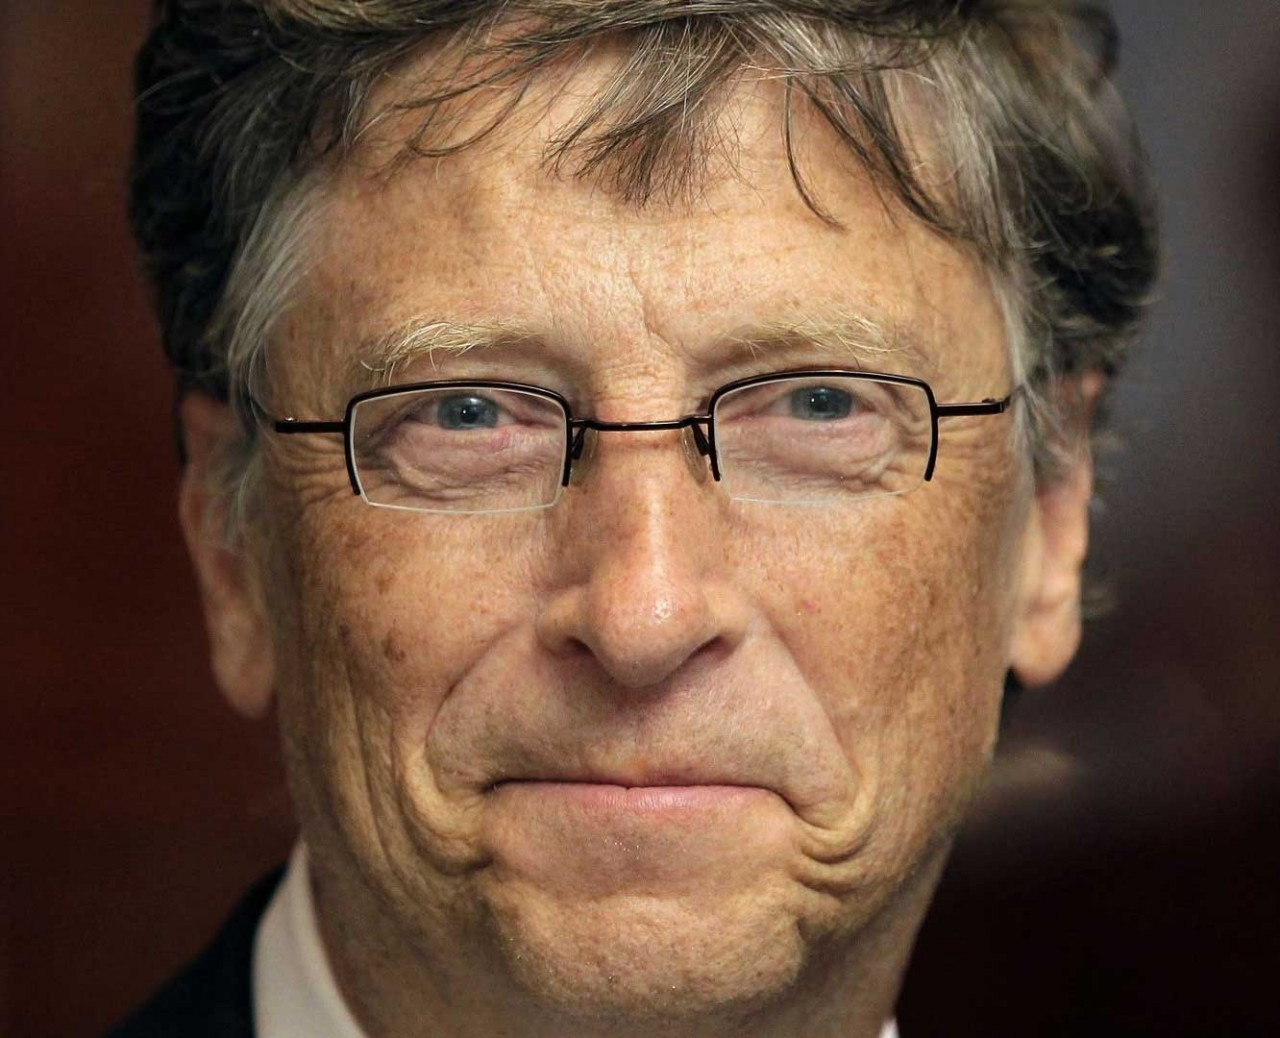 15 фактов о стиле жизни миллиардера Билла Гейтса